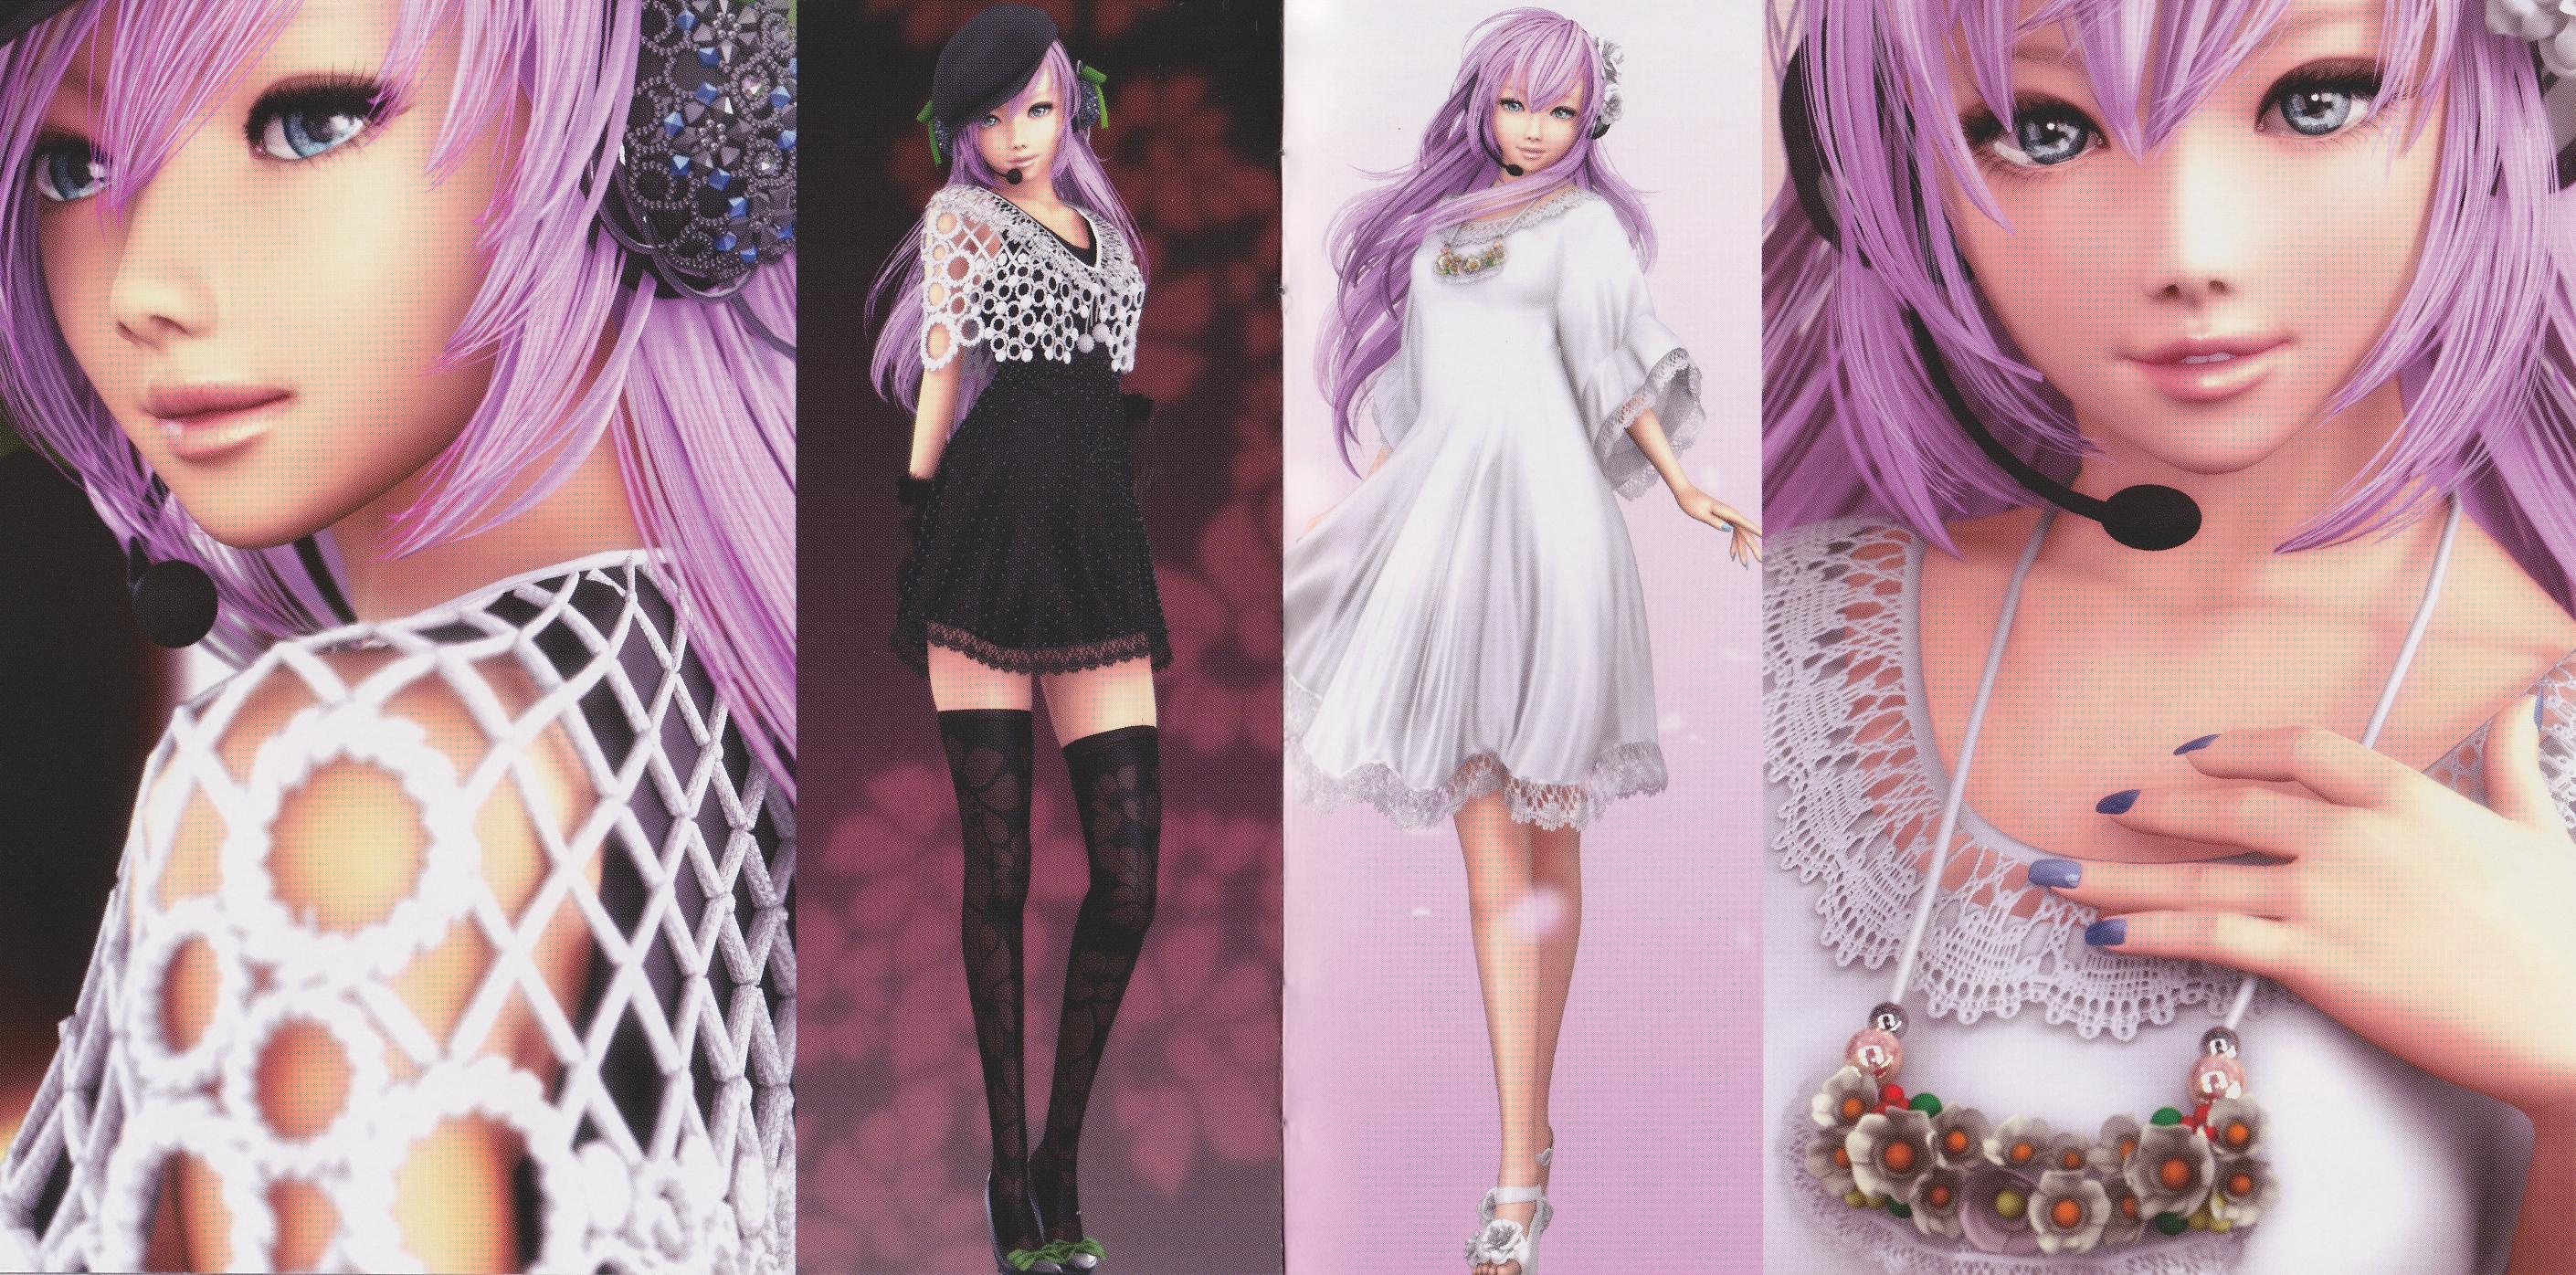 Megurine Luka Vocaloid Image 957324 Zerochan Anime